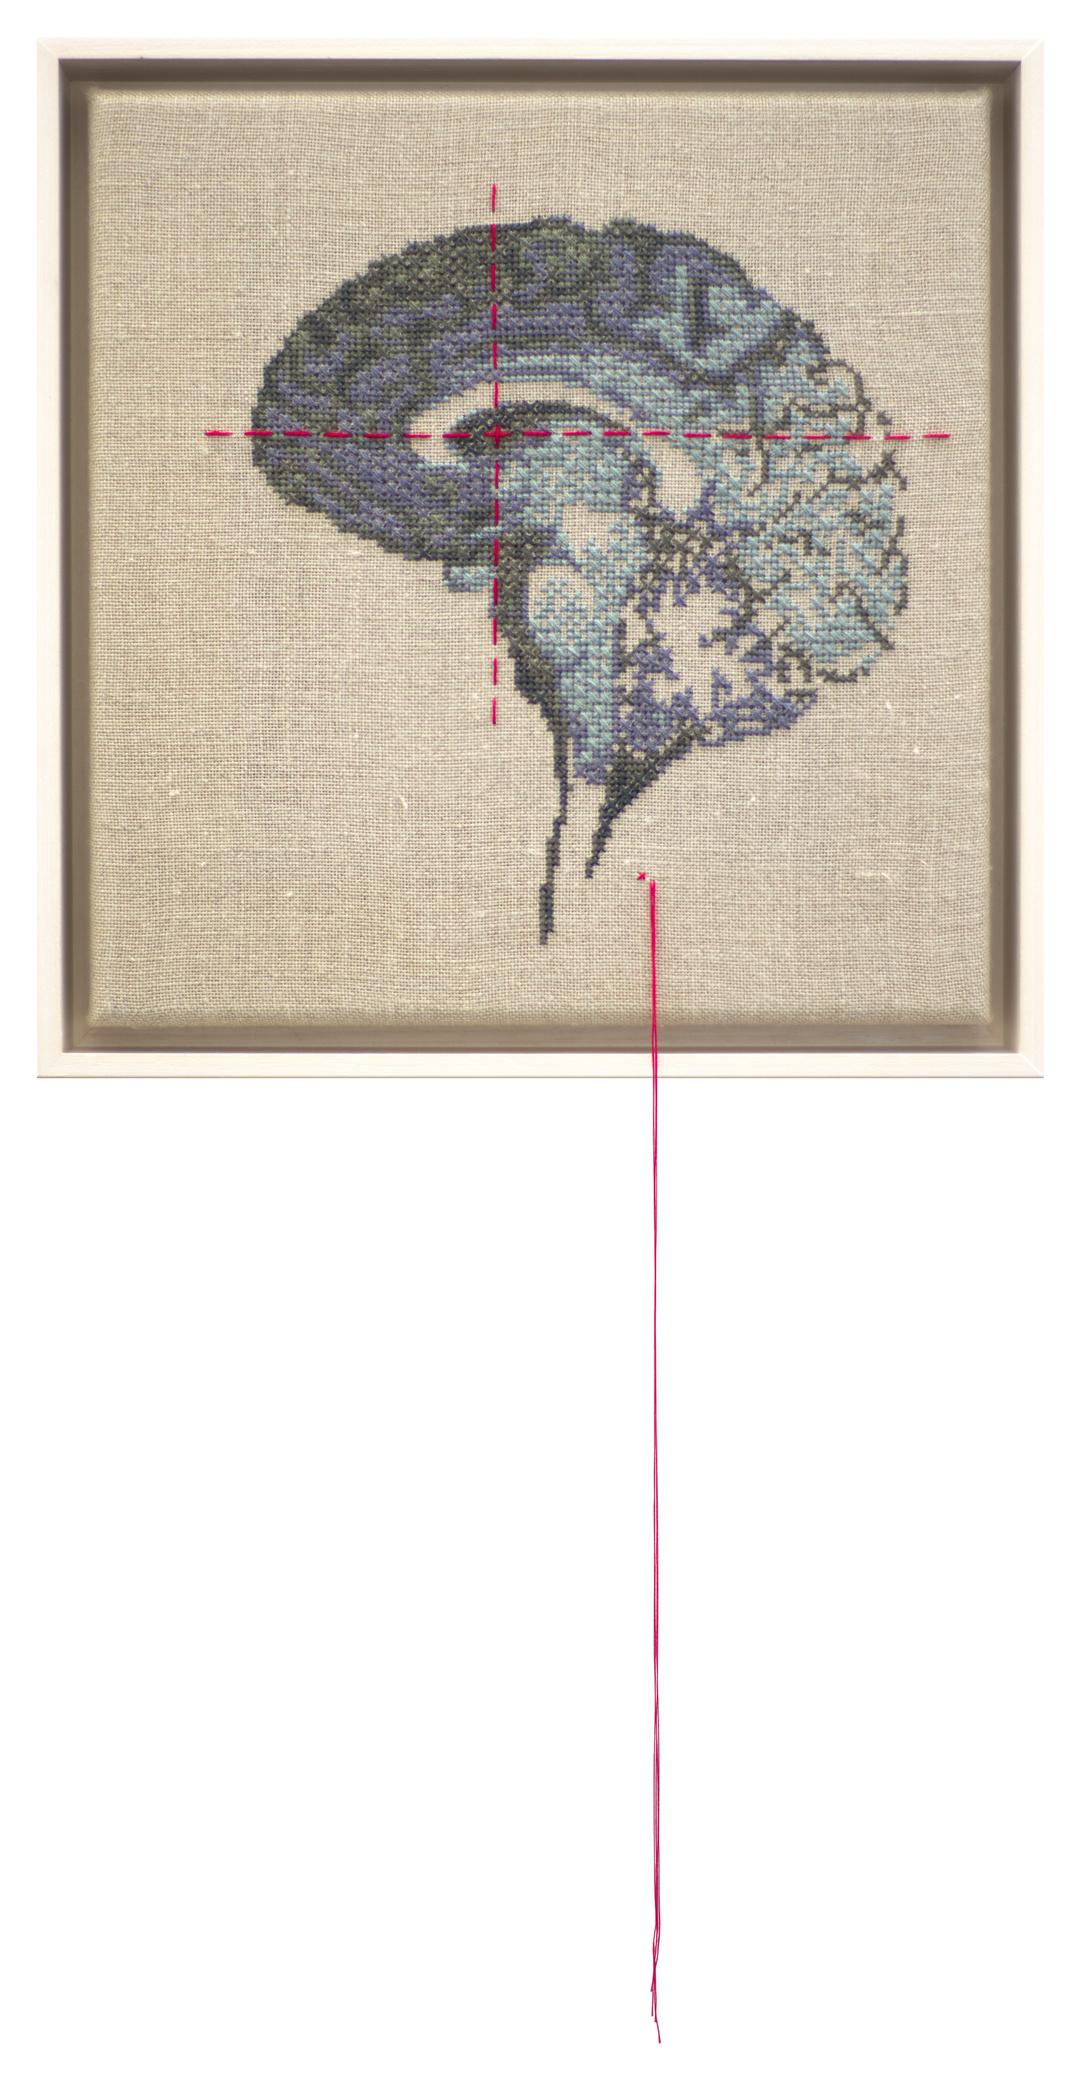 Self Portrait; Artist's Brain Stranded cotton on linen, 2018 300 x 290 mm  Stitching time: 30 hours    photo Bob Newman